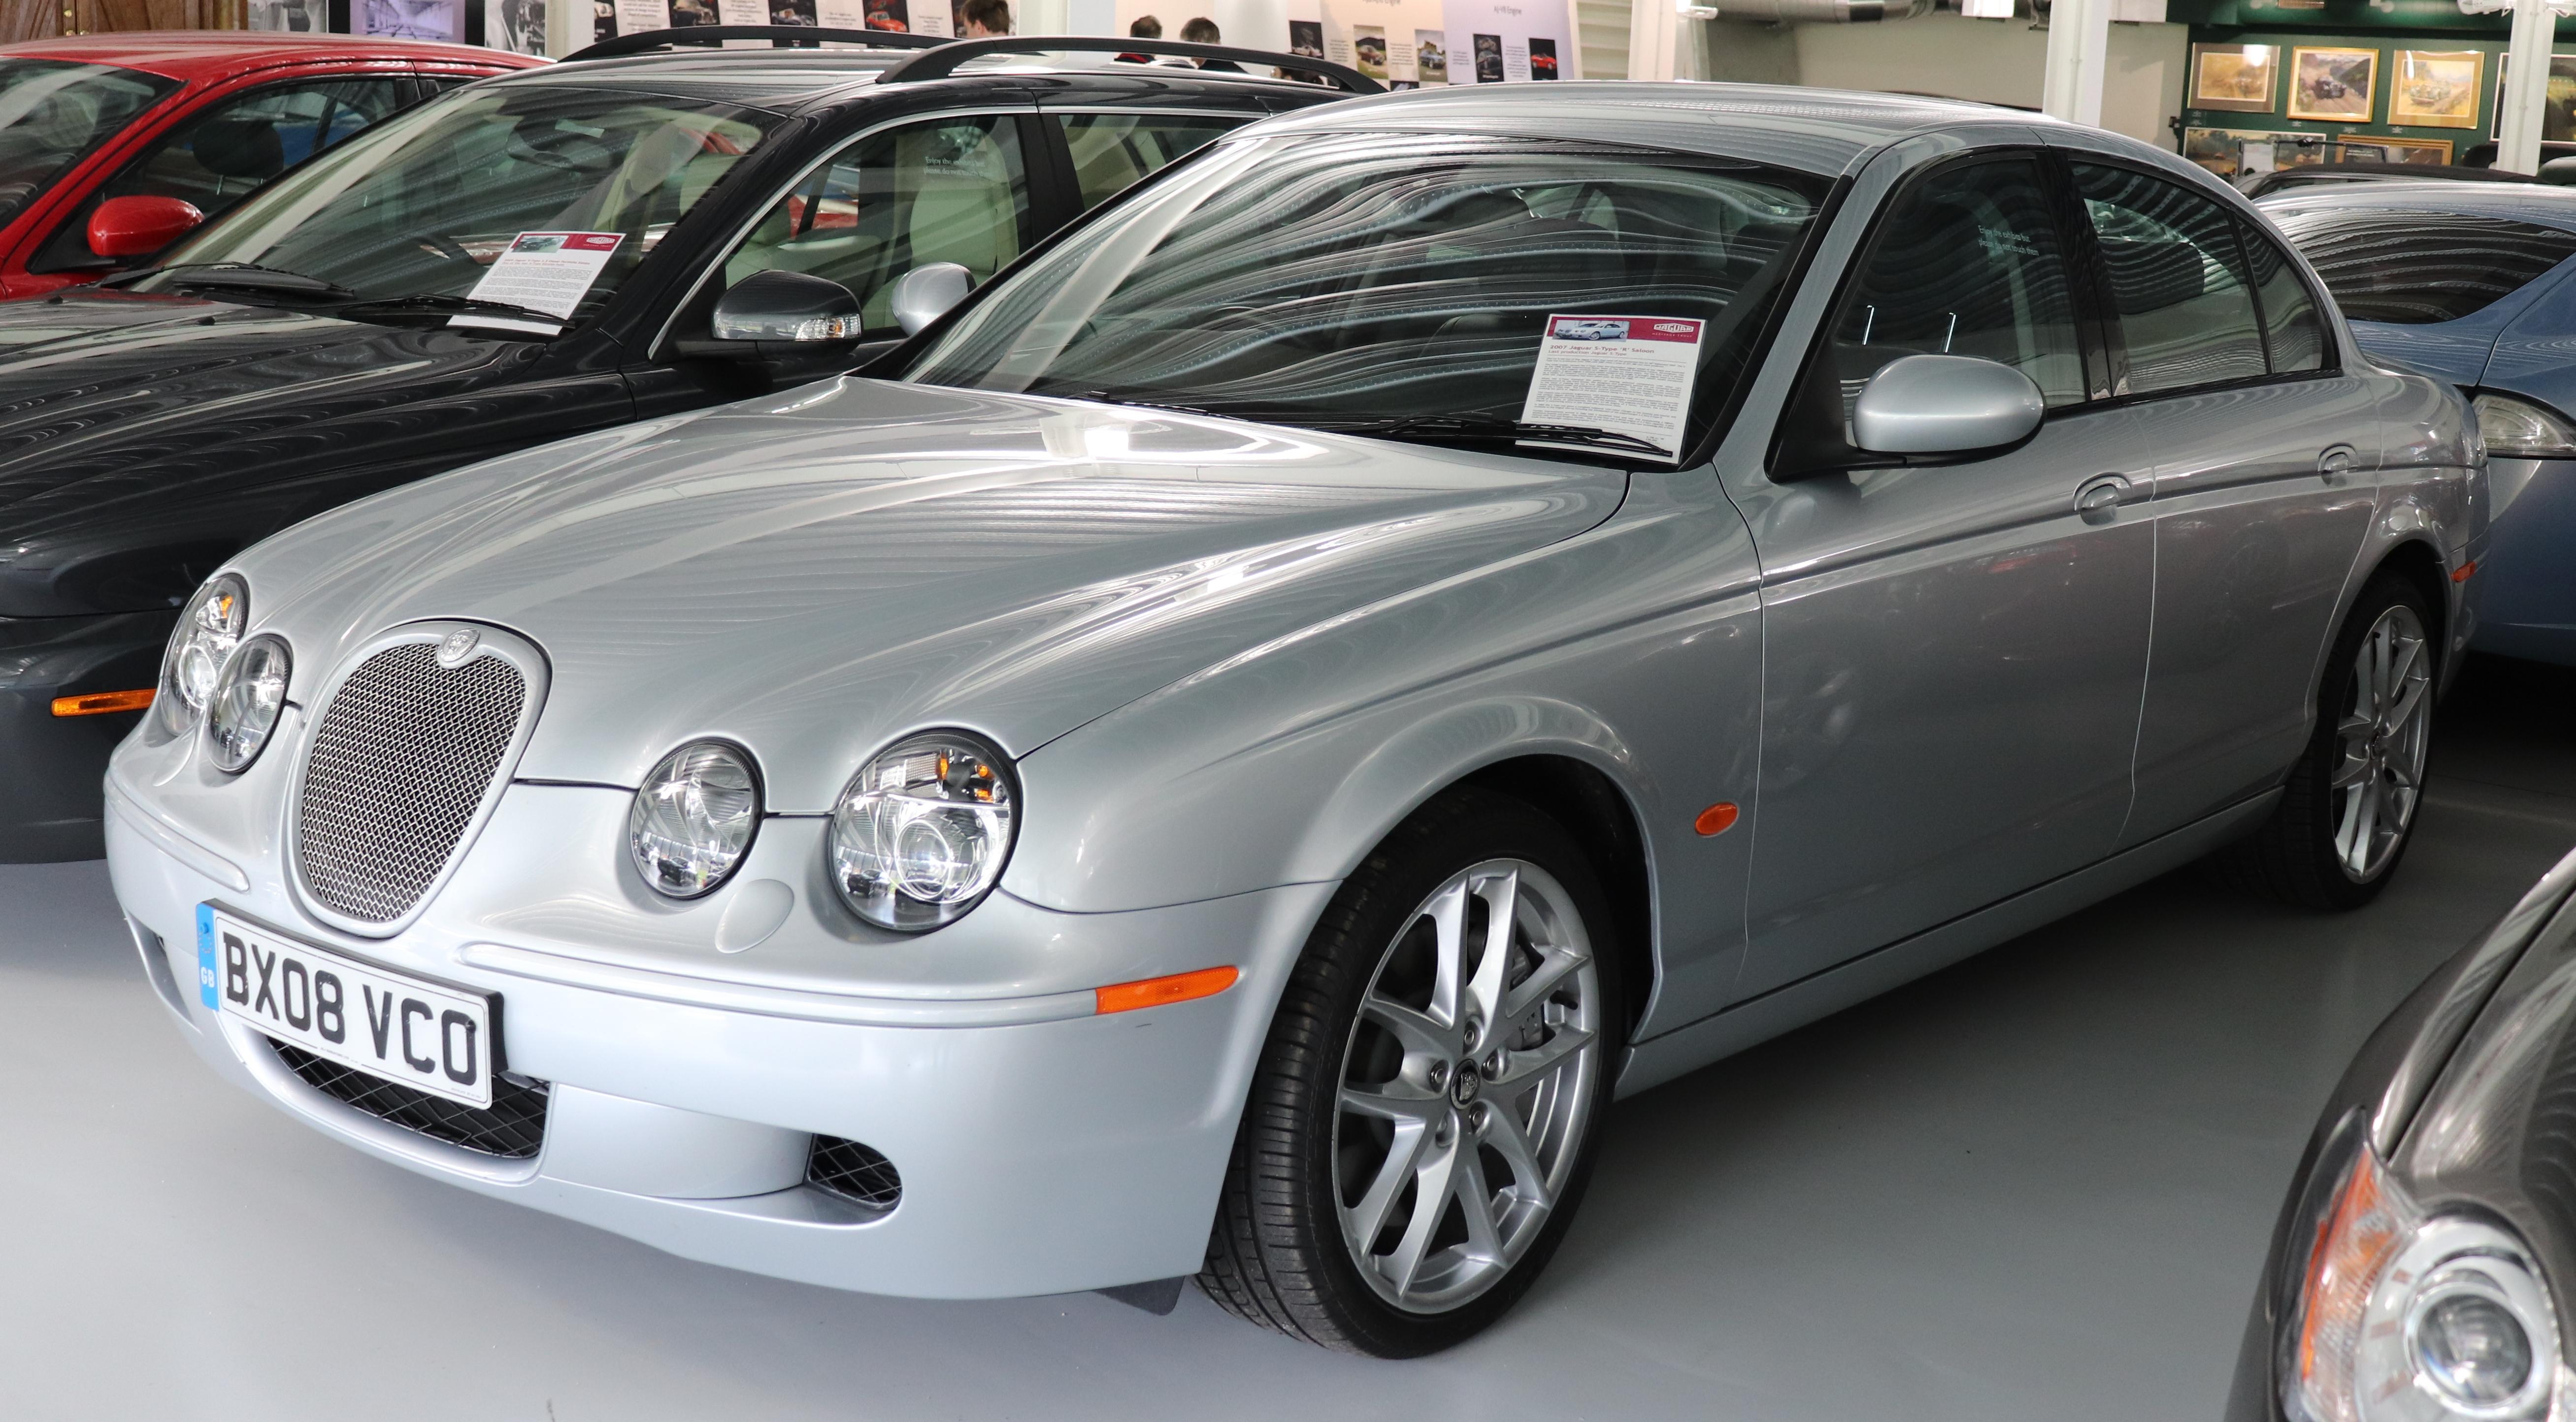 File:2007 Jaguar S-Type R 4.2.jpg - Wikimedia Commons